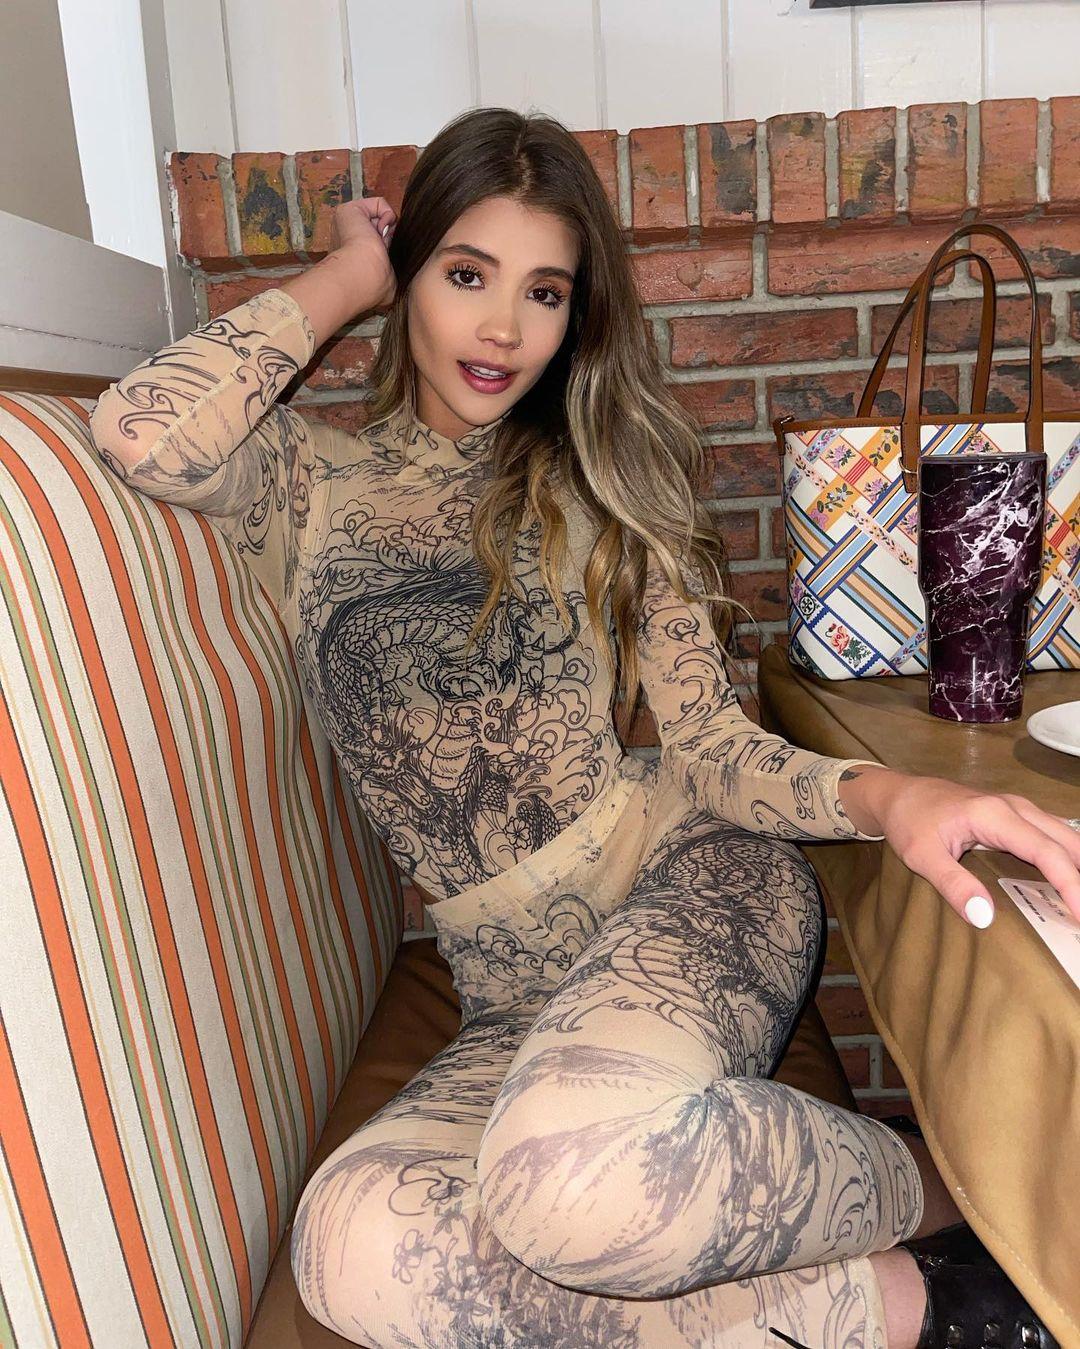 Brenda-Guzman-Wallpapers-Insta-Biography-3